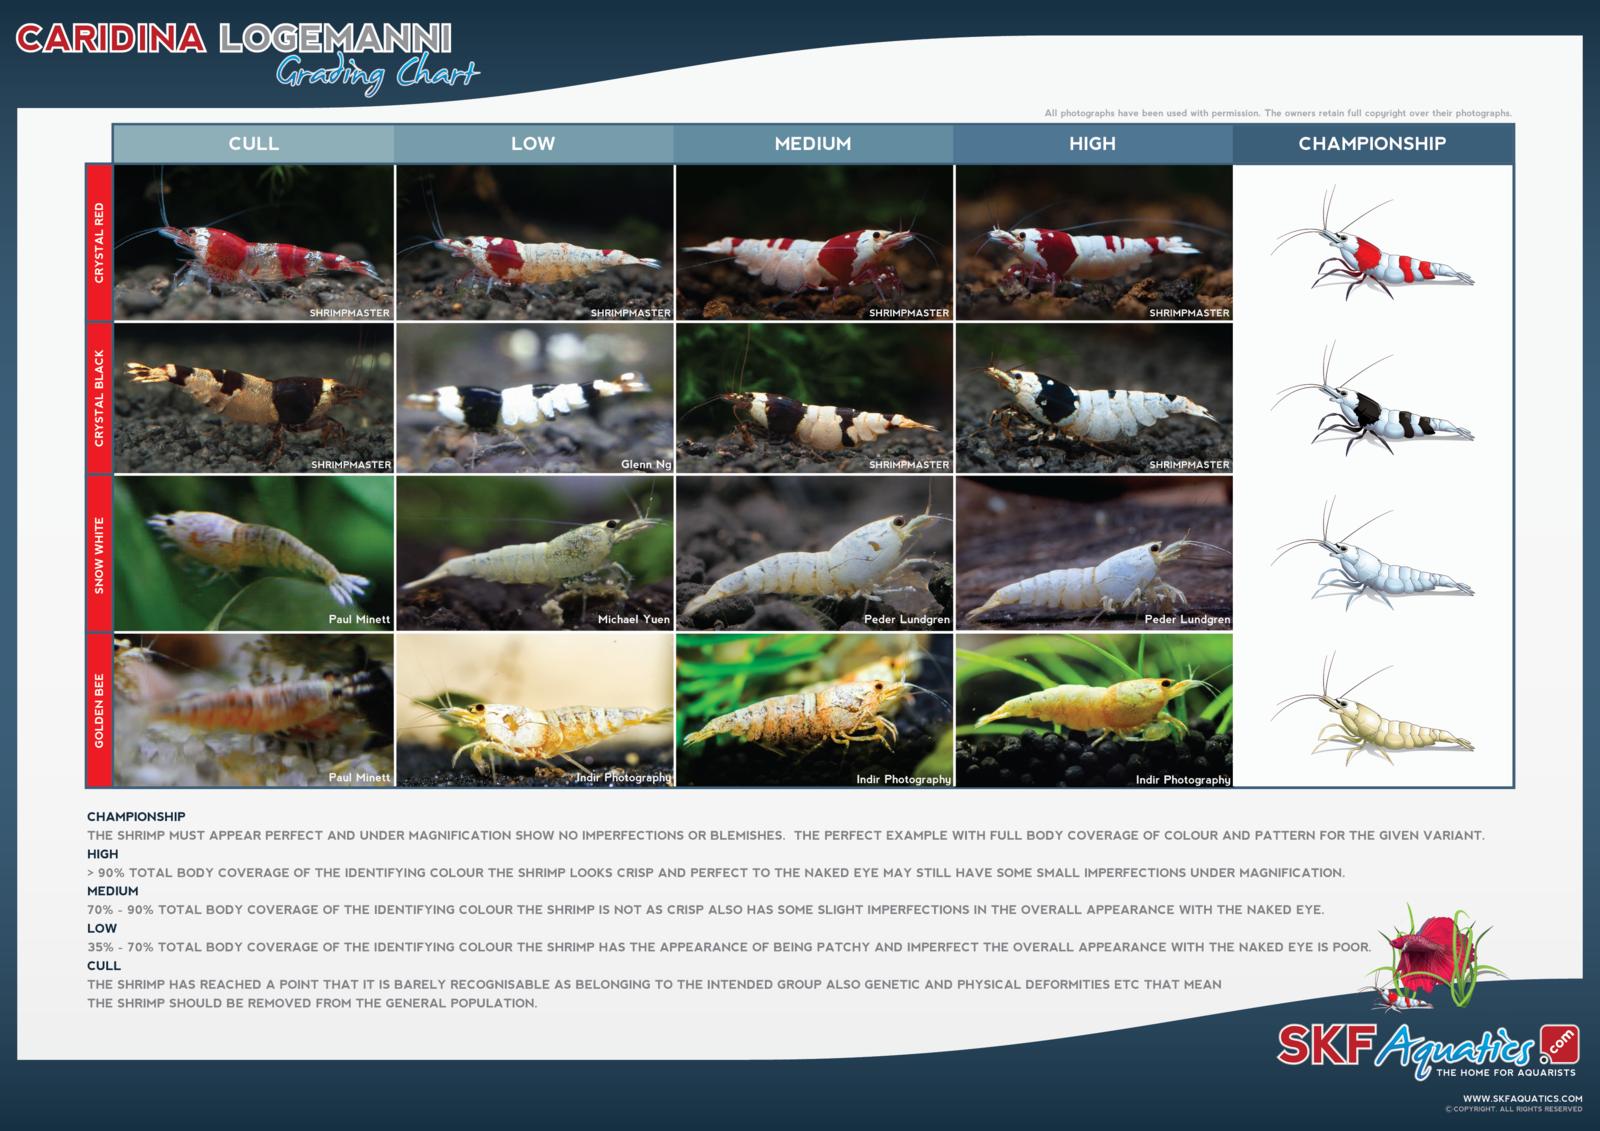 large.SKF_Caridina_Logemanni_Photo_Grades_300dpi.png